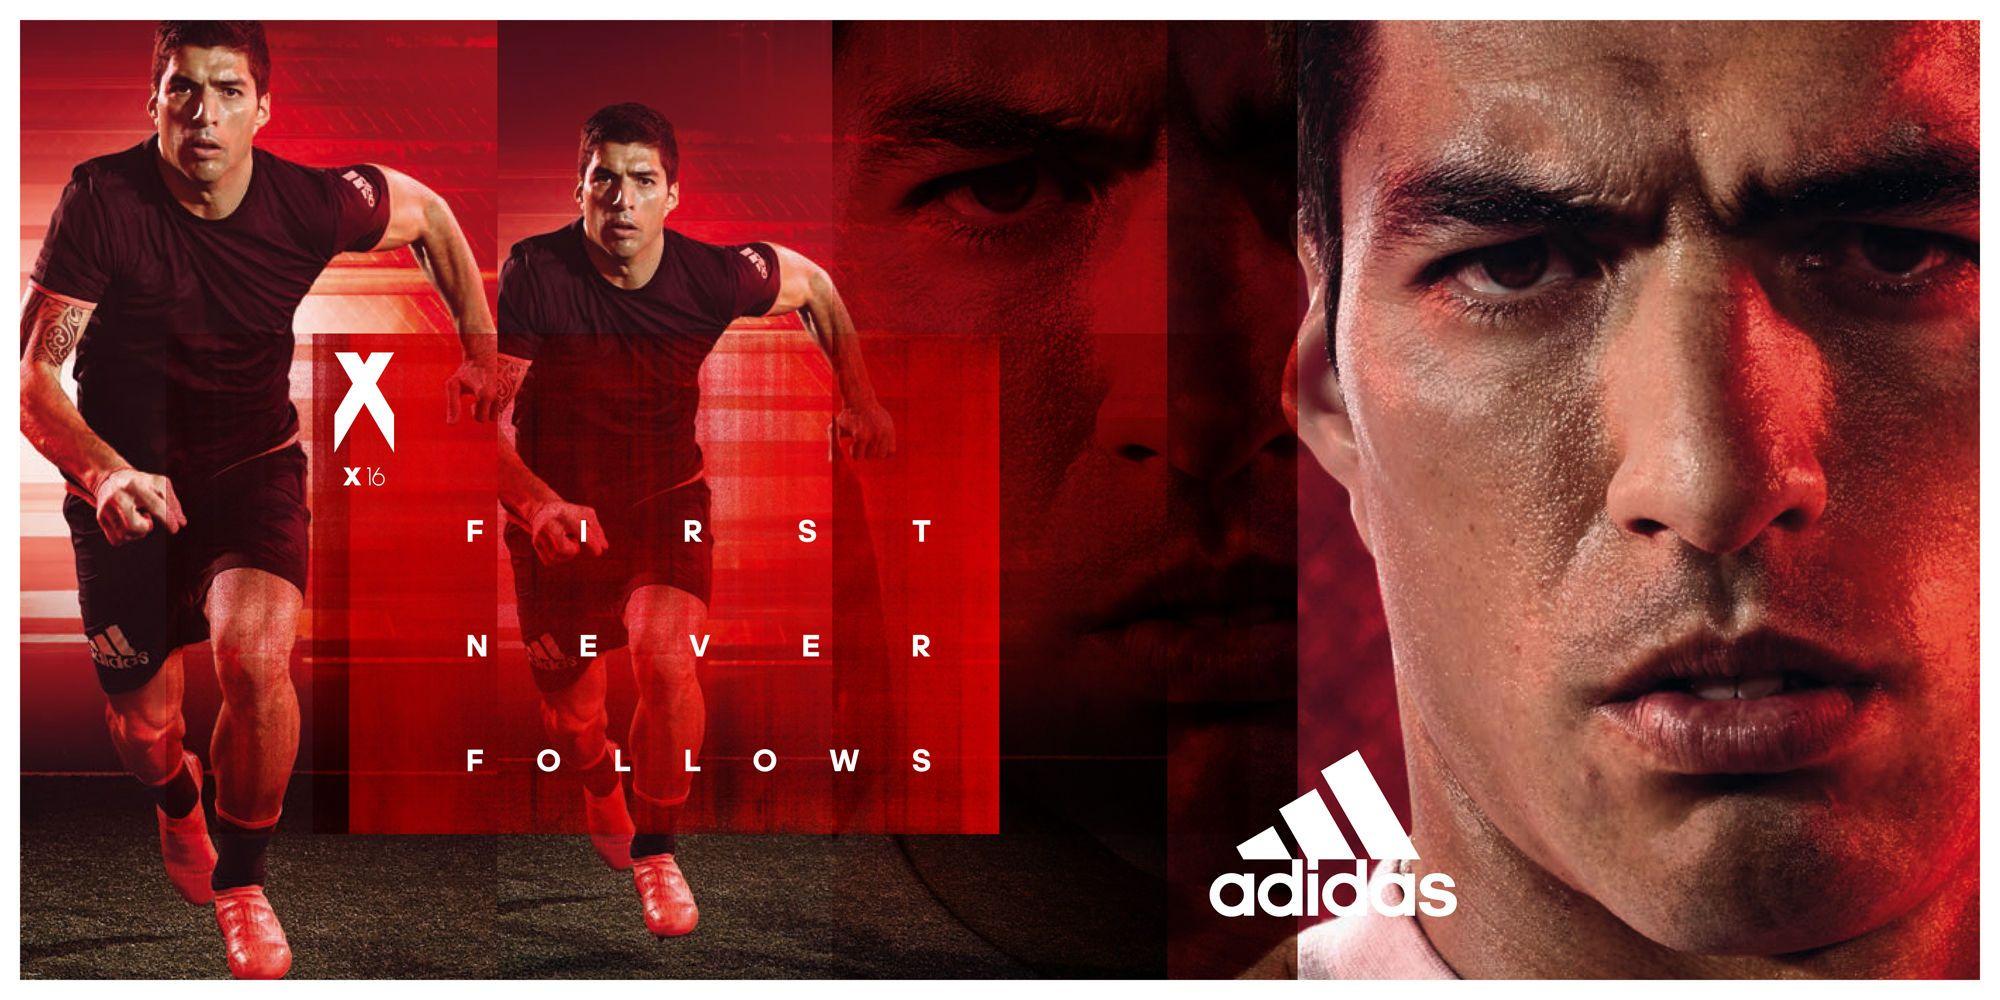 George Stevenson visa En contra  ADIDAS 'First Never Follows'   ADIDAS   presented by GoSee   Adidas  presents, Adidas, One